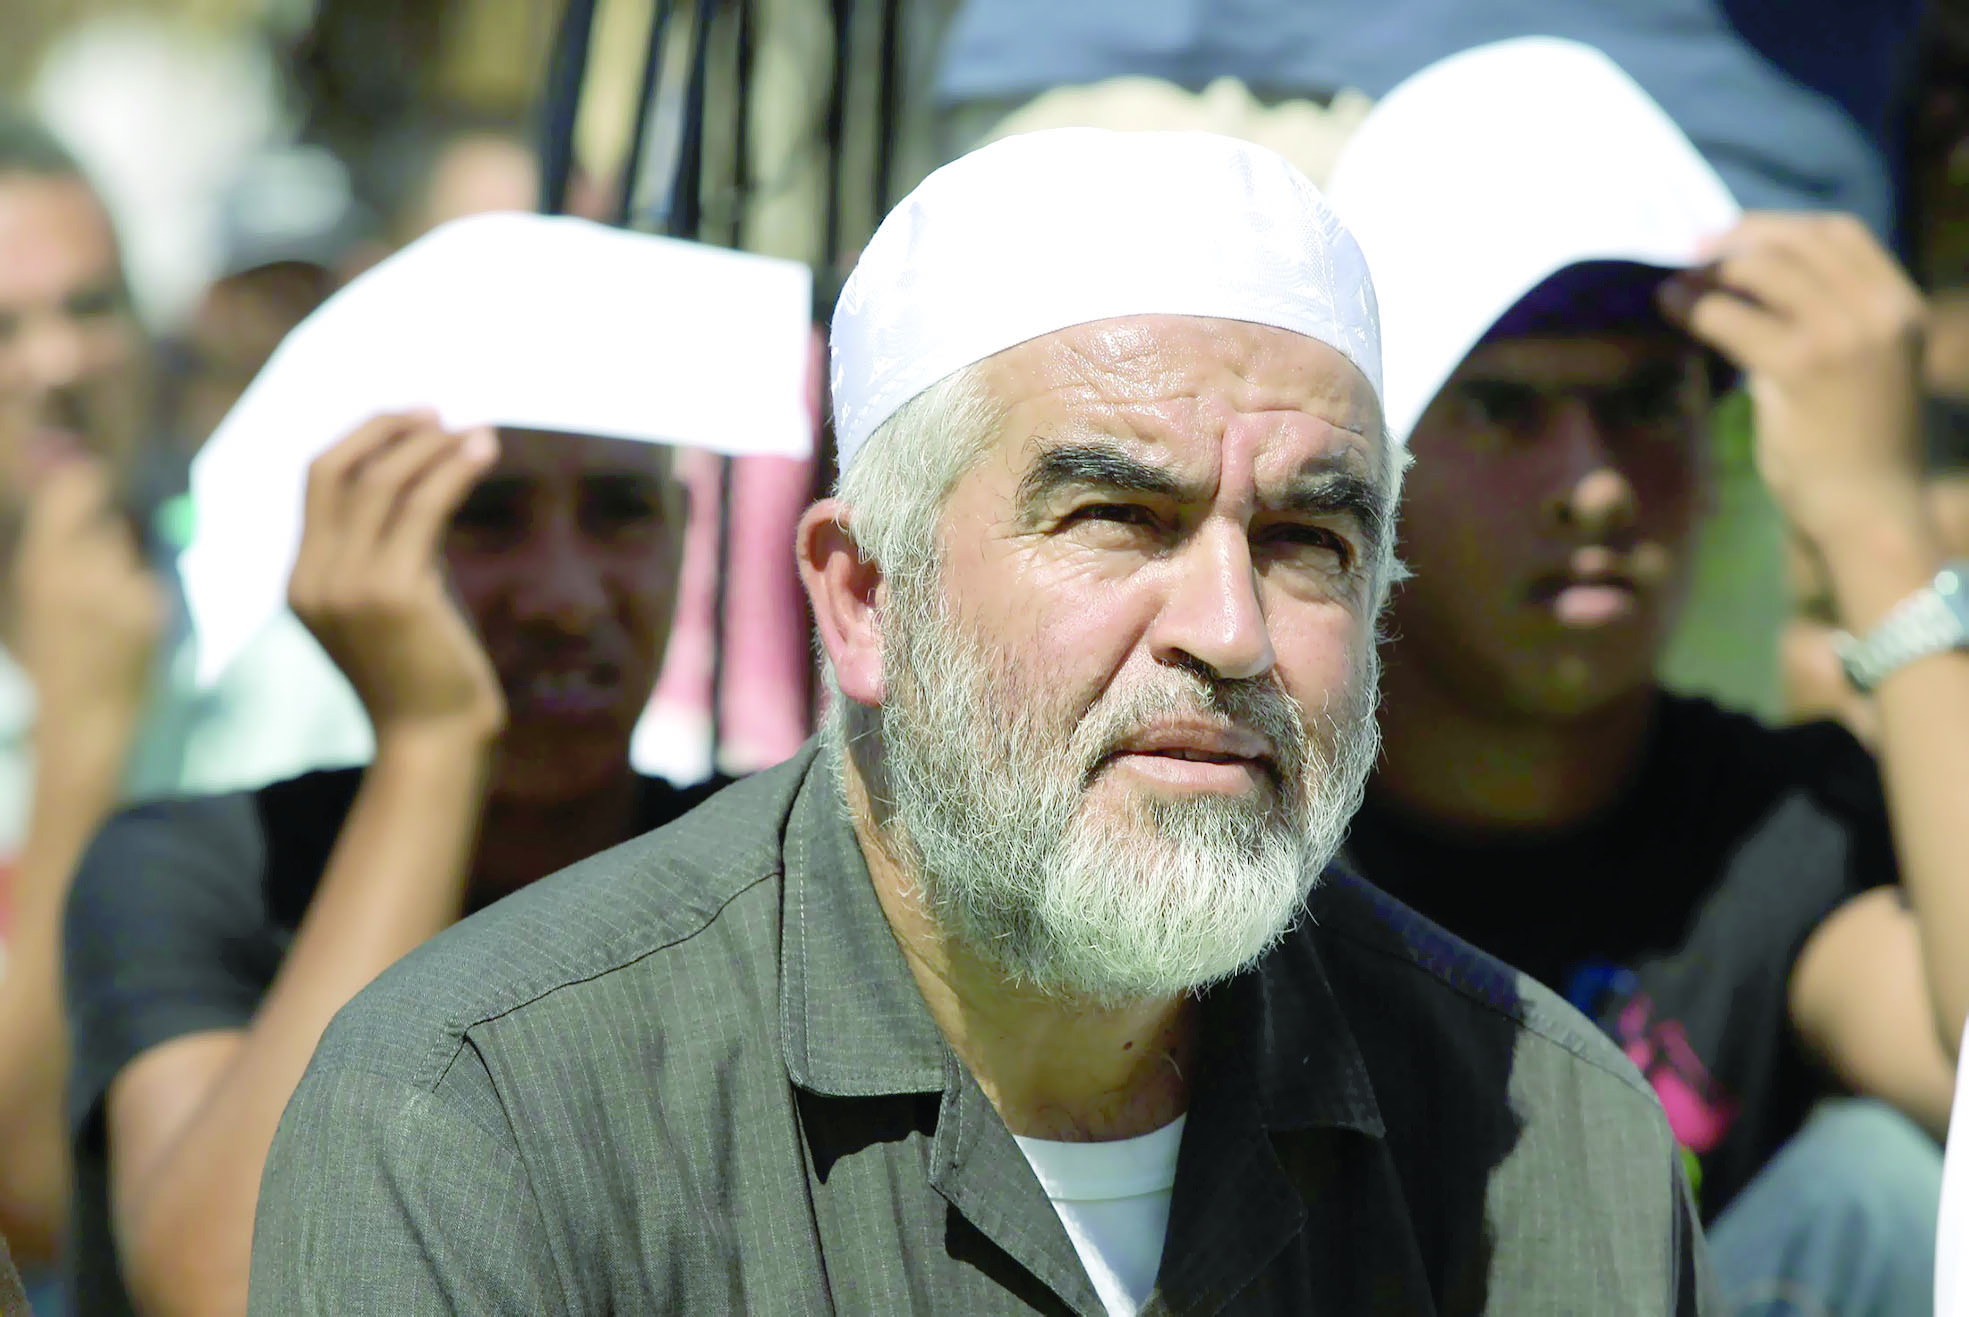 """نتنياهو"" يشن حملة ضد رائد صلاح داعيا لإبعاده أو سجنه"